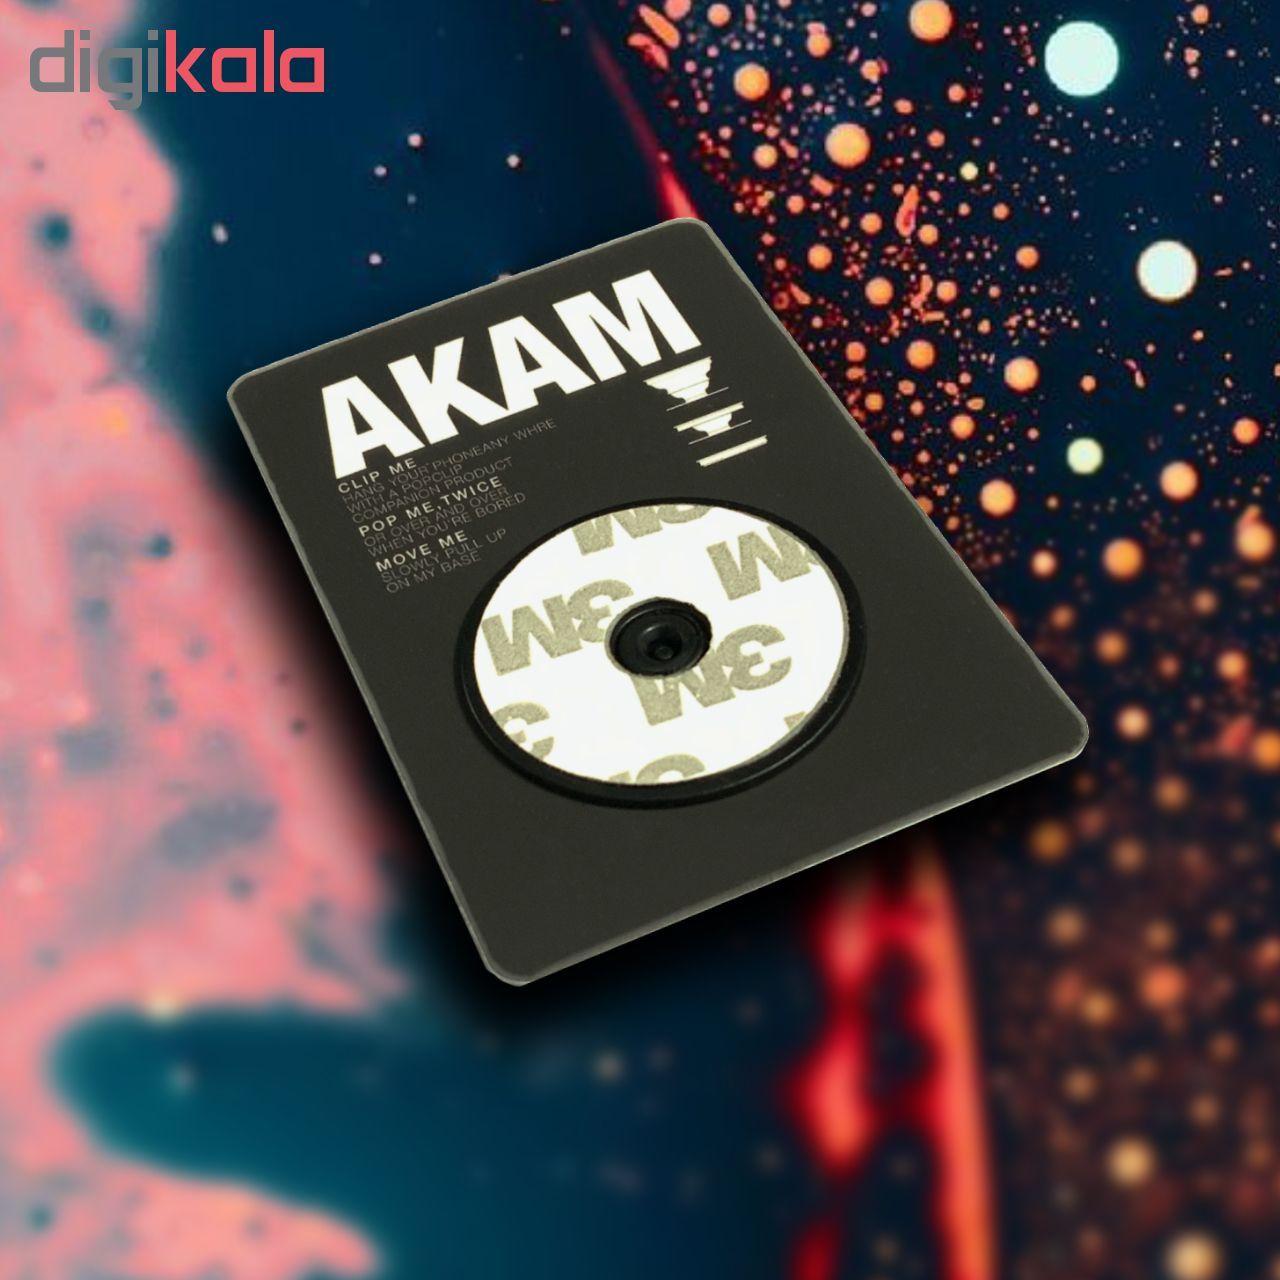 پایه نگهدارنده گوشی موبایل پاپ سوکت آکام مدل APS0191 main 1 2